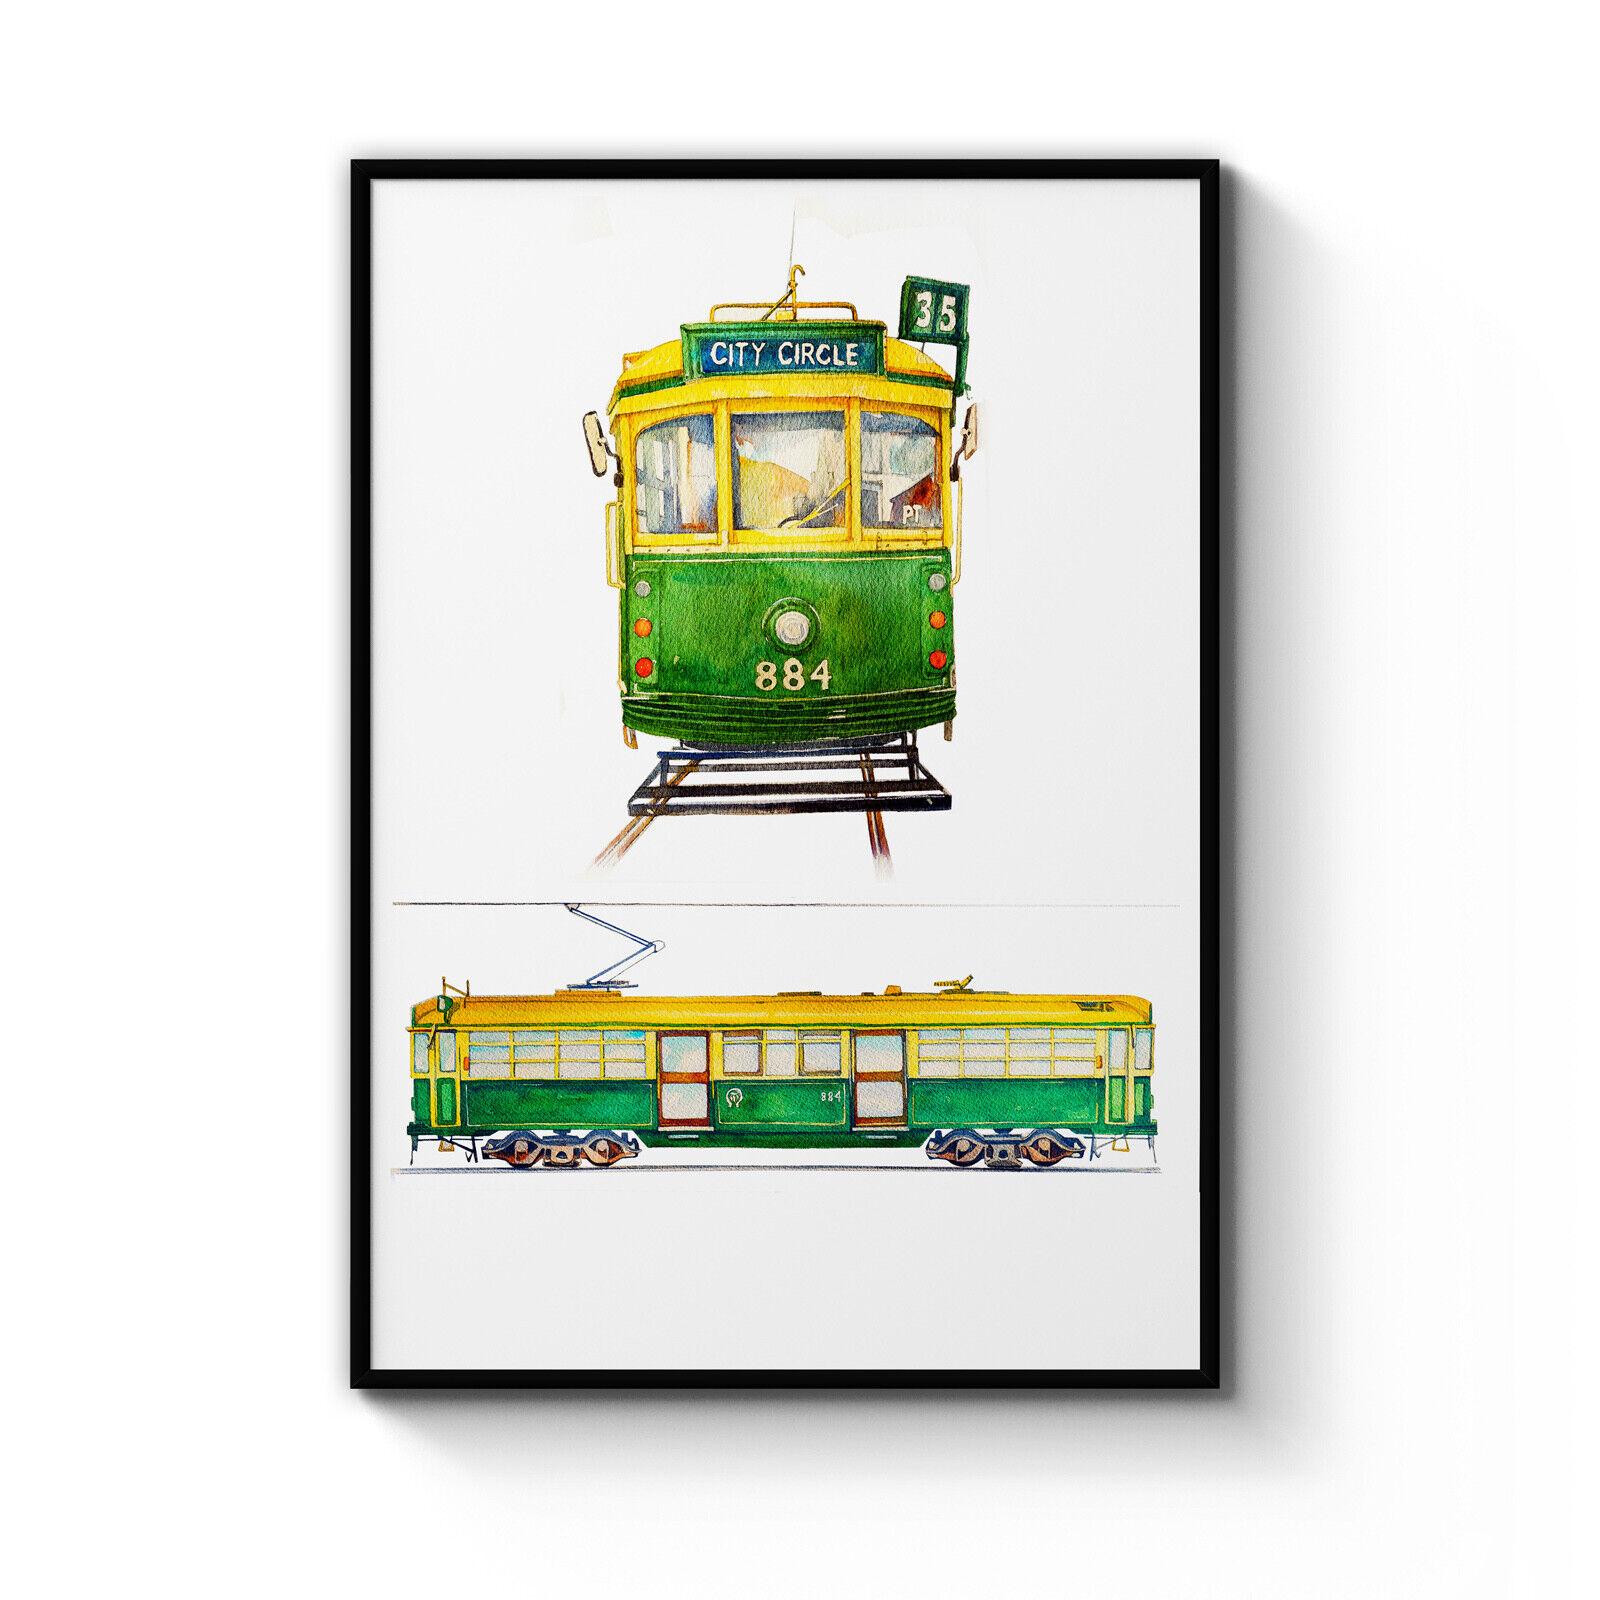 Melbourne Old Grün Tram Painting Australia Art Print Poster  A4 - B1 Framed